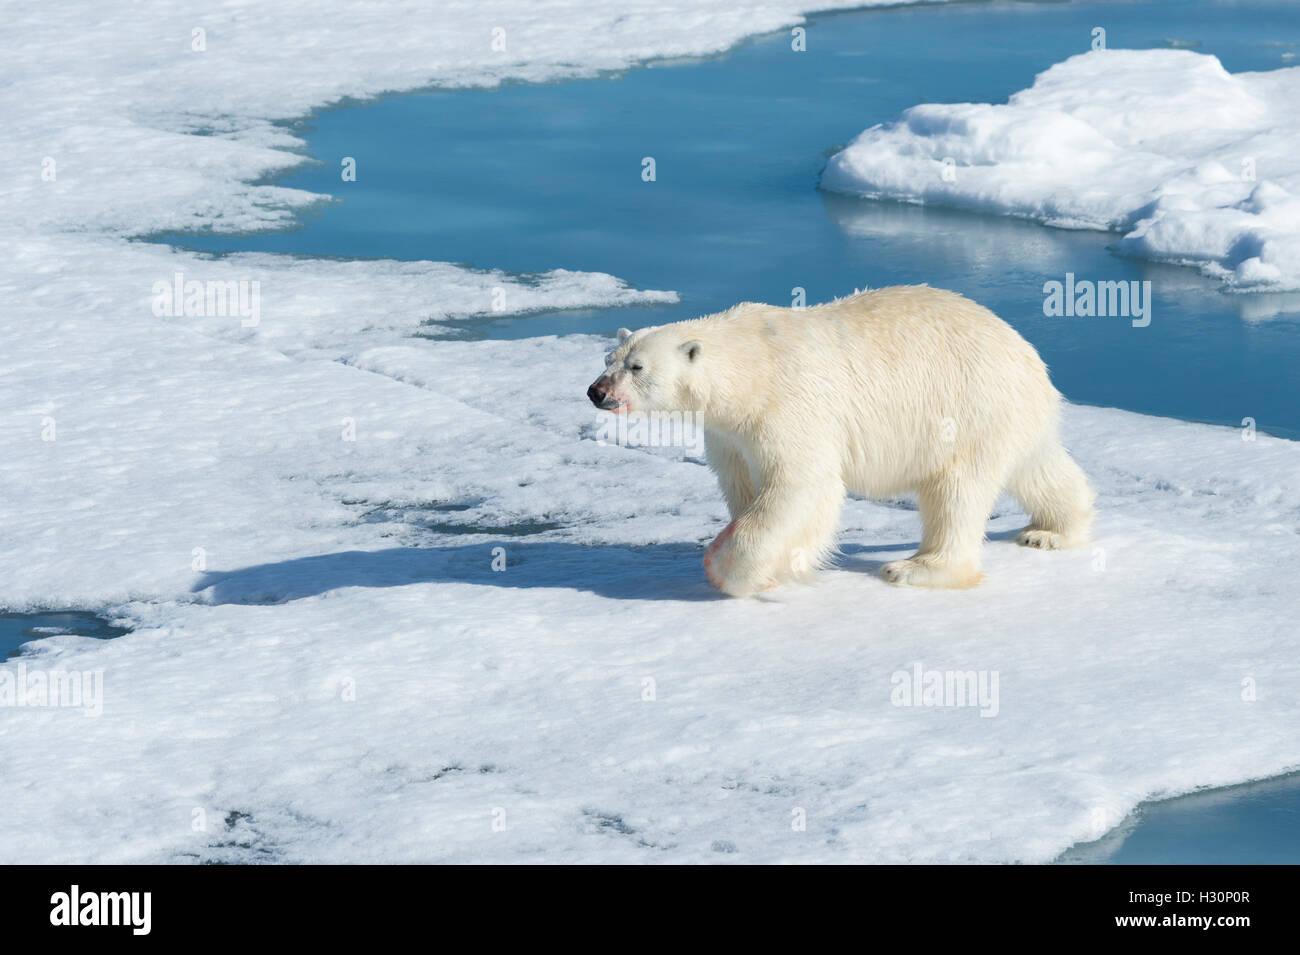 Male Polar Bear (Ursus maritimus) walking on the pack ice, Spitsbergen Island, Svalbard archipelago, Norway, Europe - Stock Image